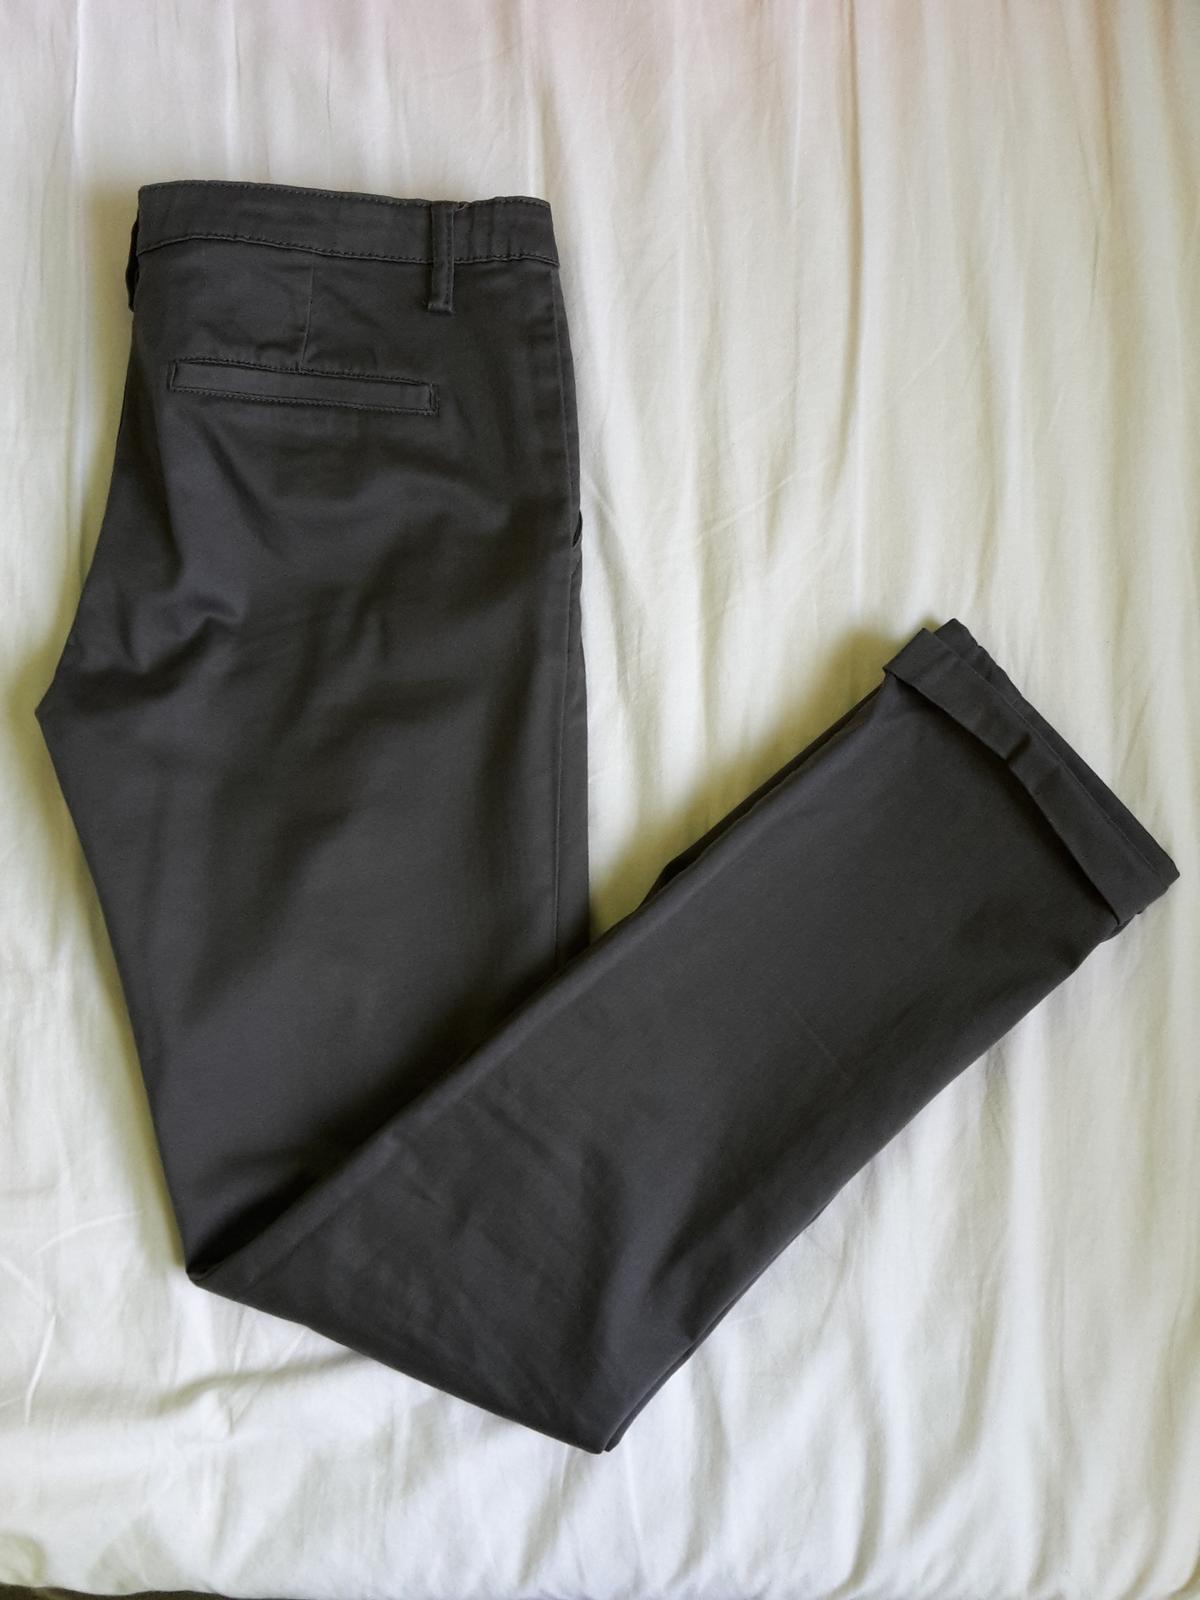 Tmavosede nohavice len oprane - Obrázok č. 1